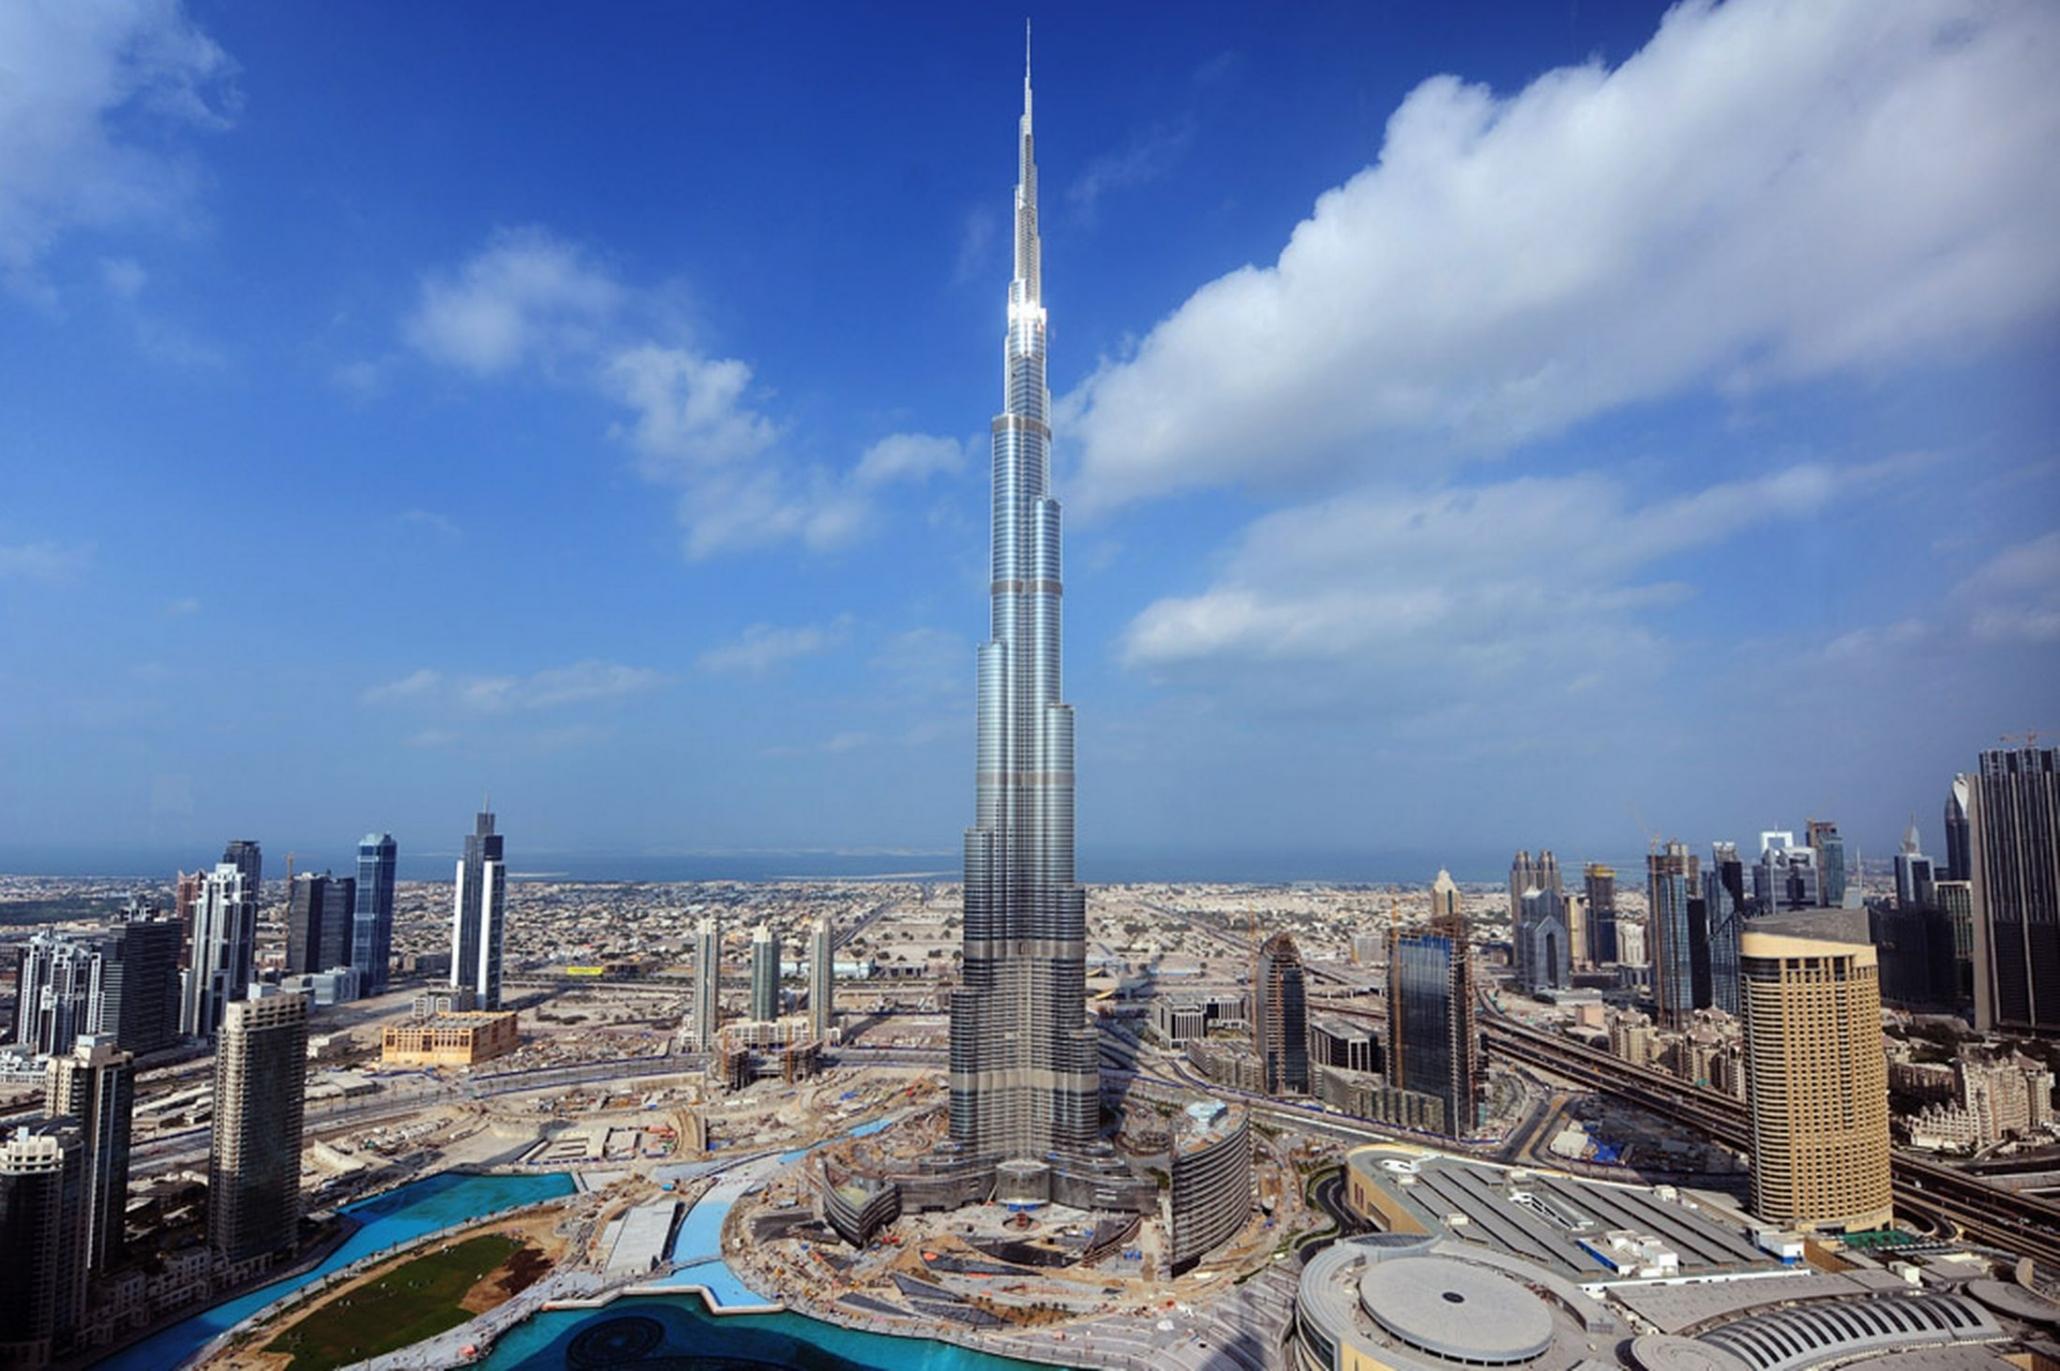 Emirates Grand Hotel Dubai Emirats Arabes Unis